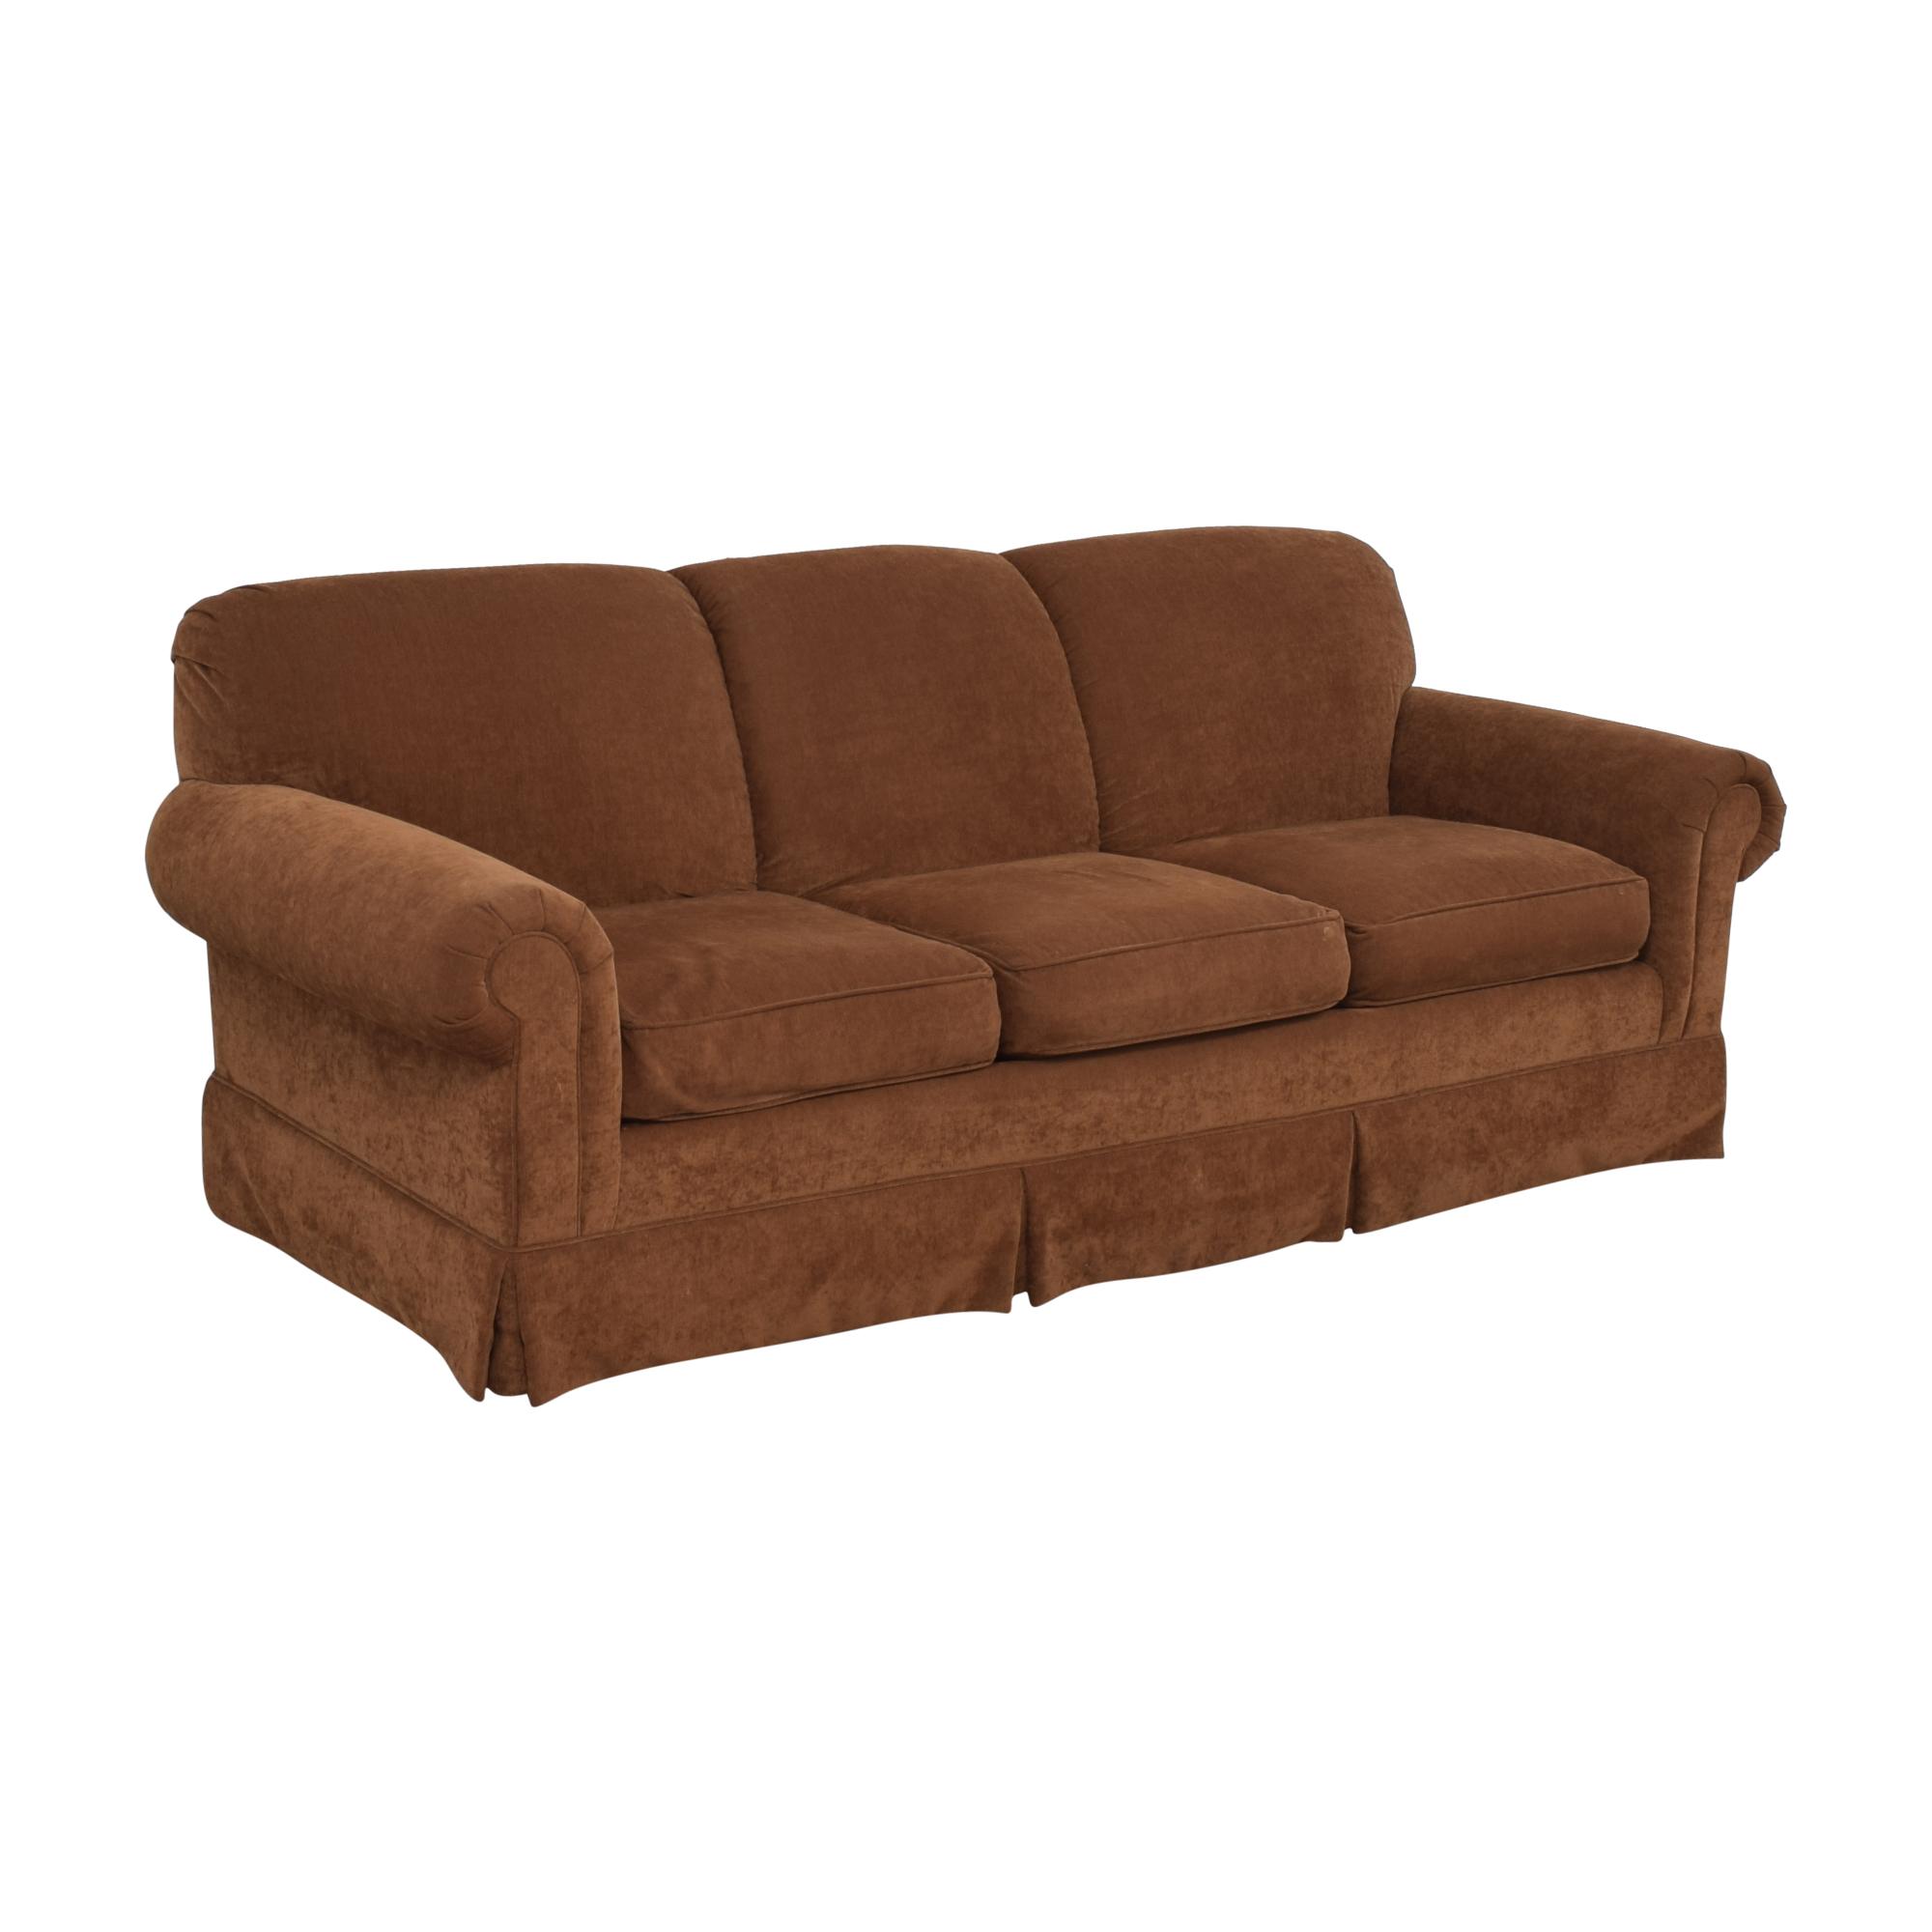 Thomasville Lancaster Sofa / Sofas